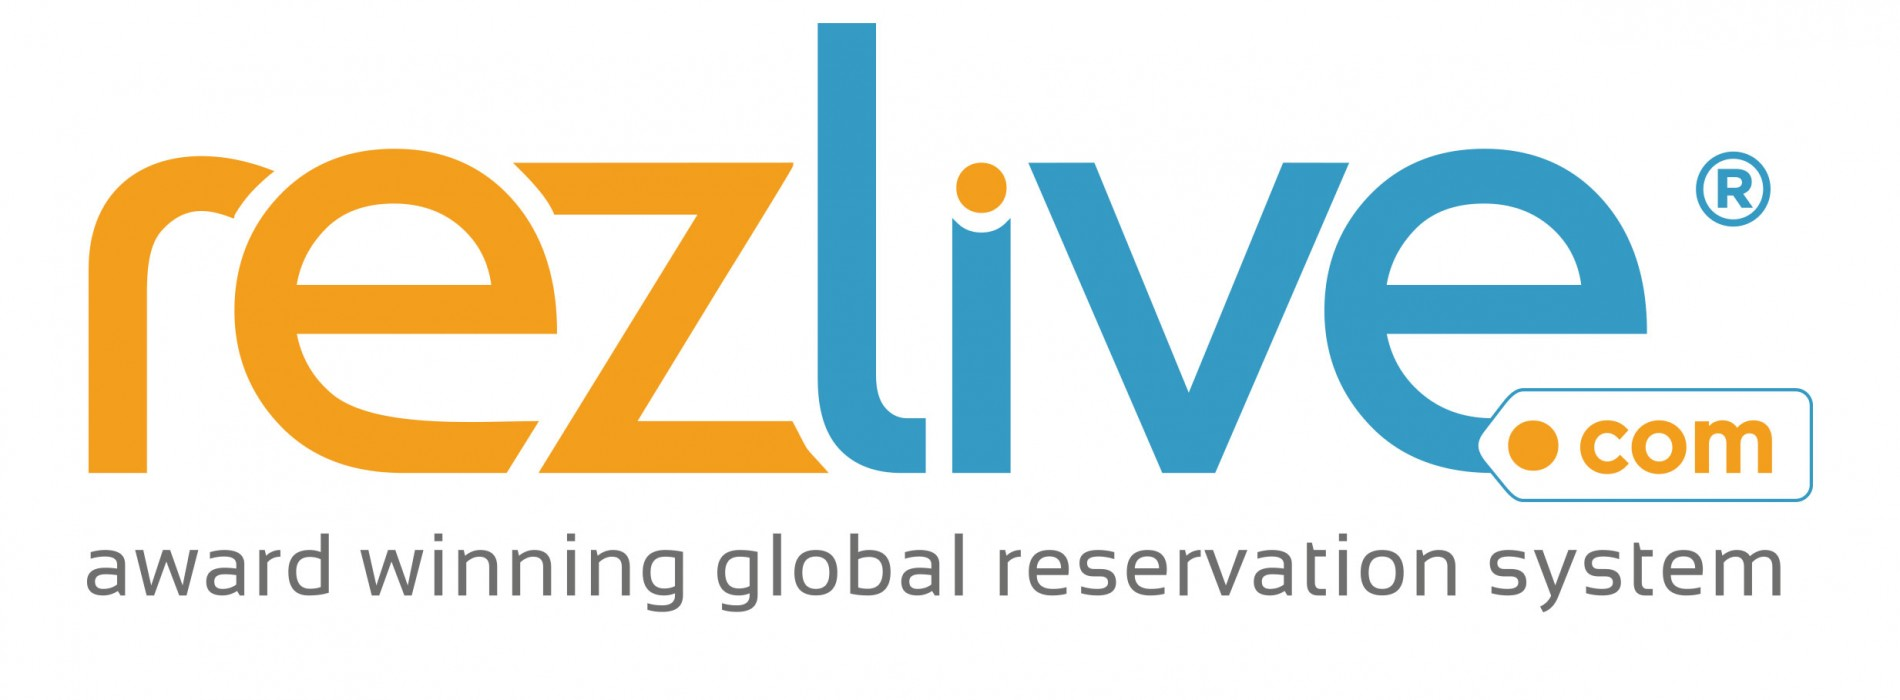 Rezlive.com is now a Superbrand